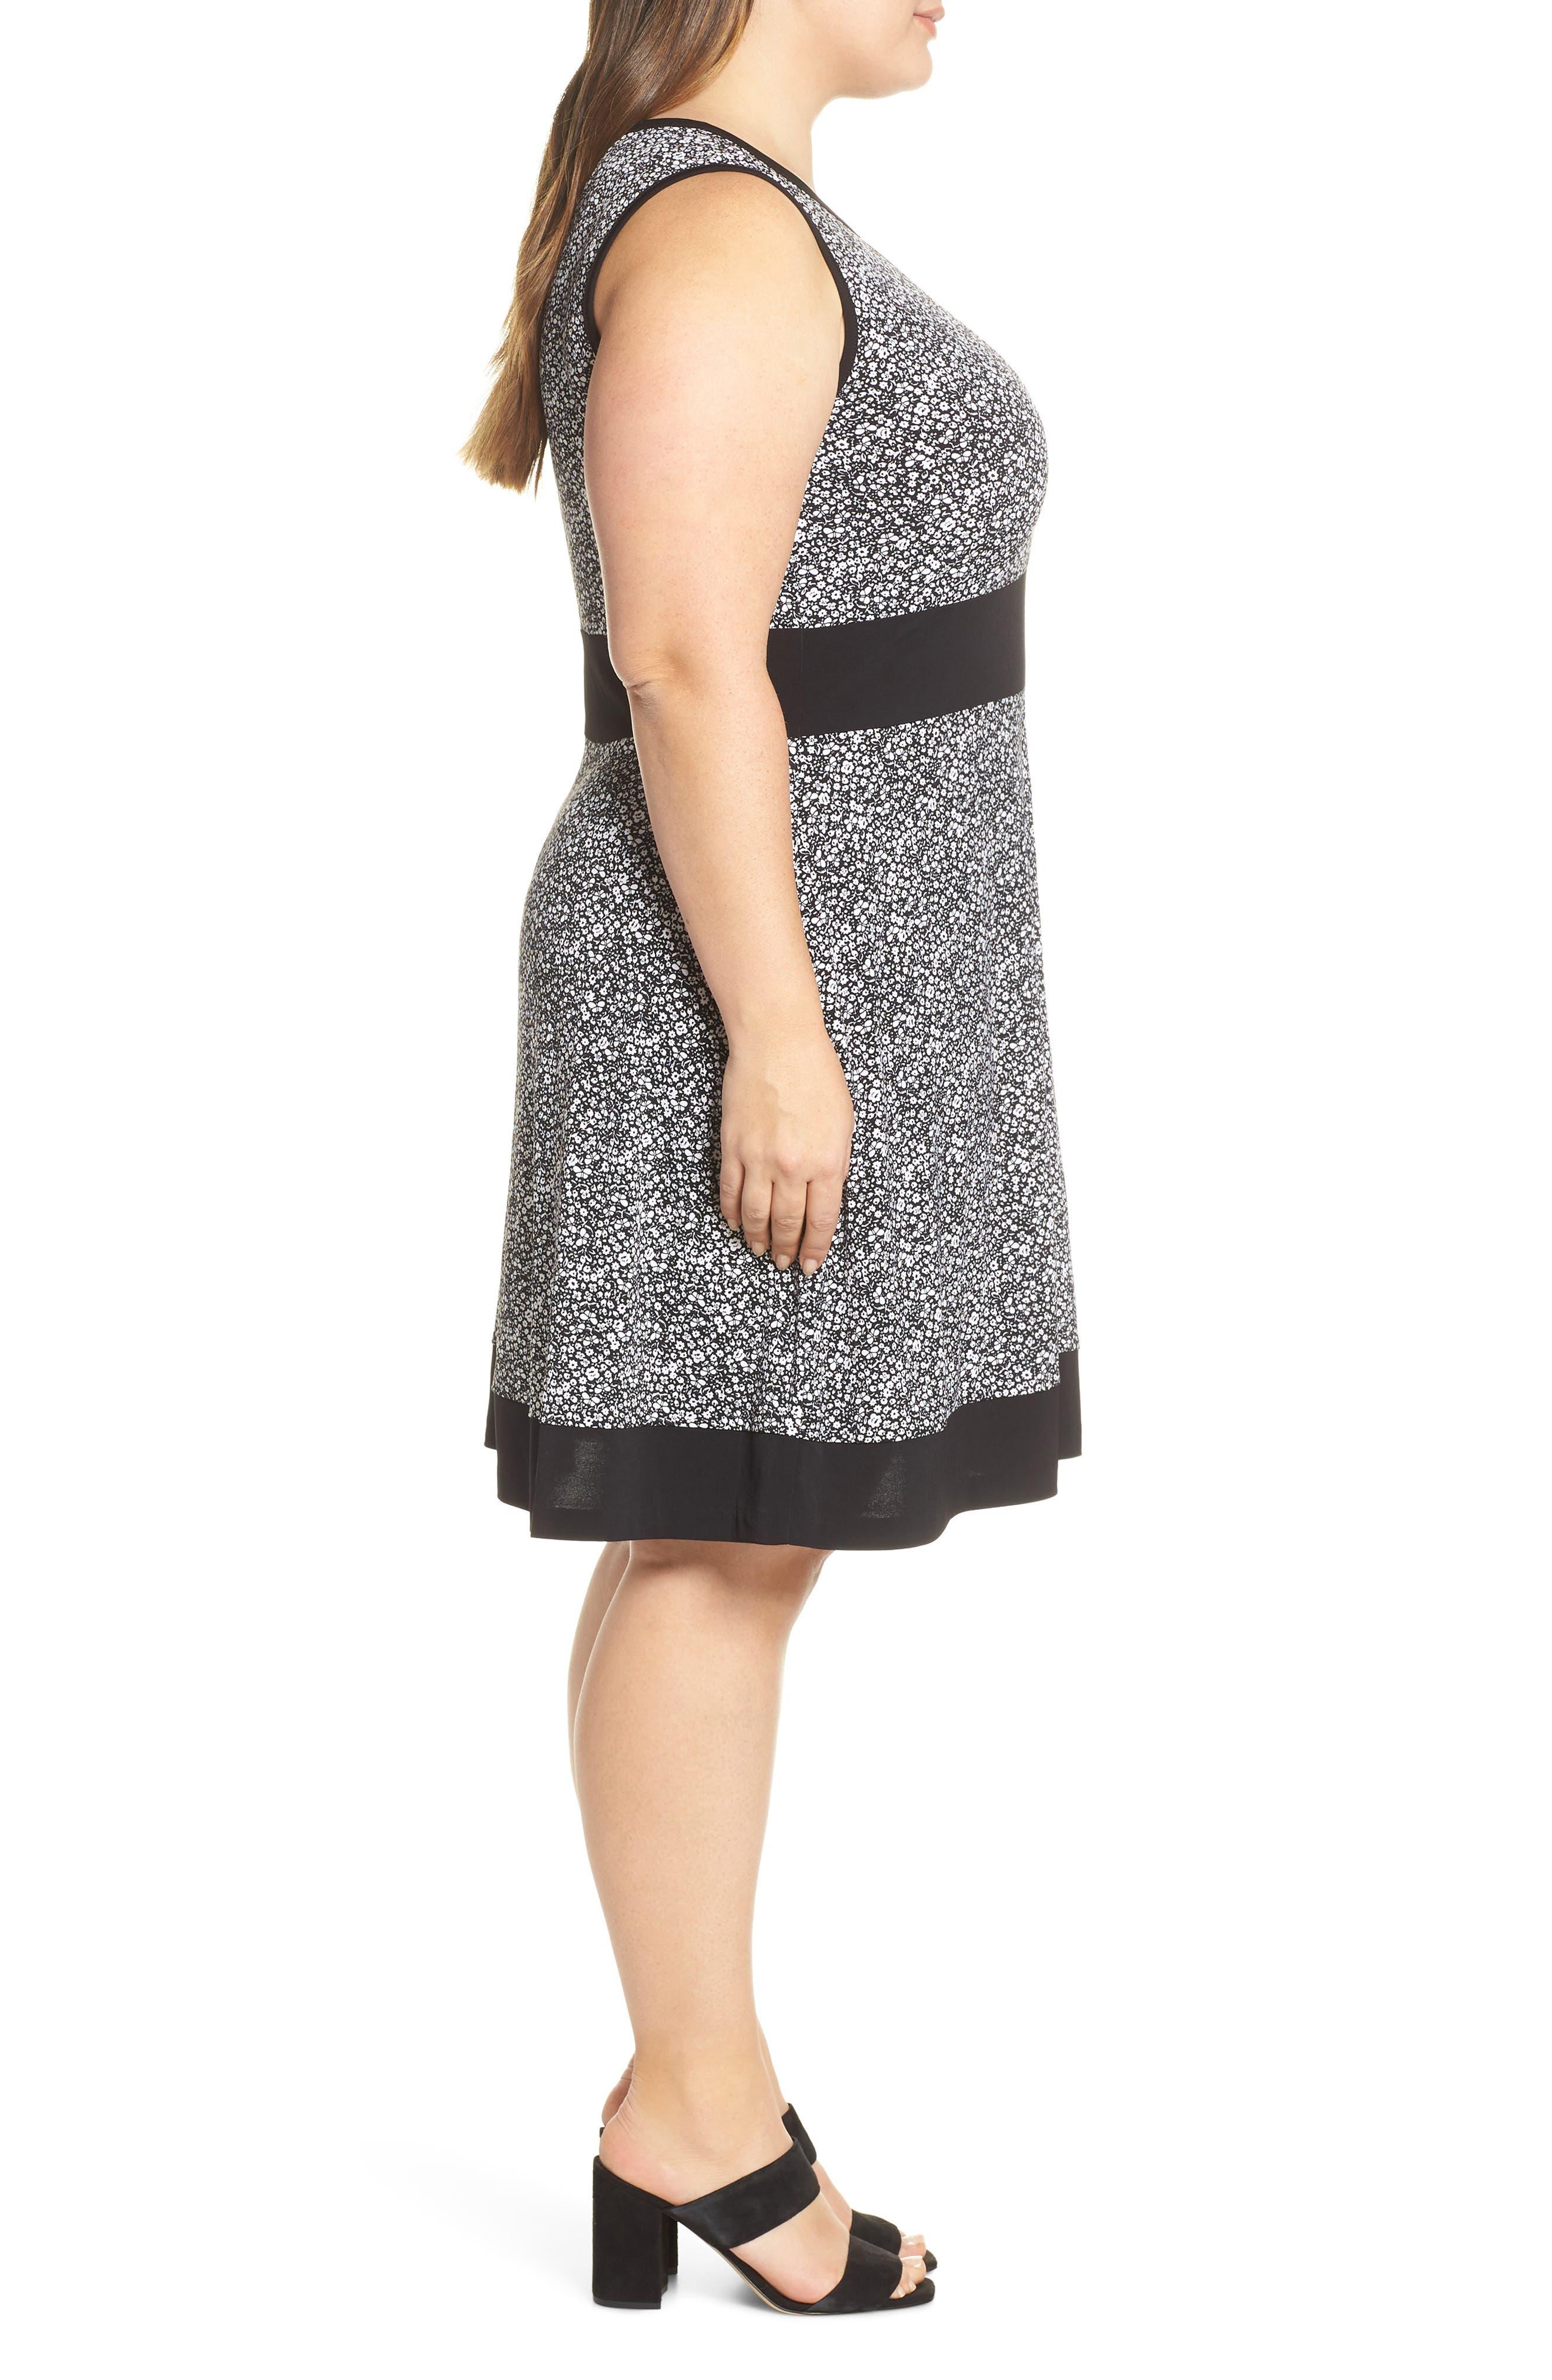 MICHAEL MICHAEL KORS, Spring Twist Dress, Alternate thumbnail 4, color, BLACK/ WHITE